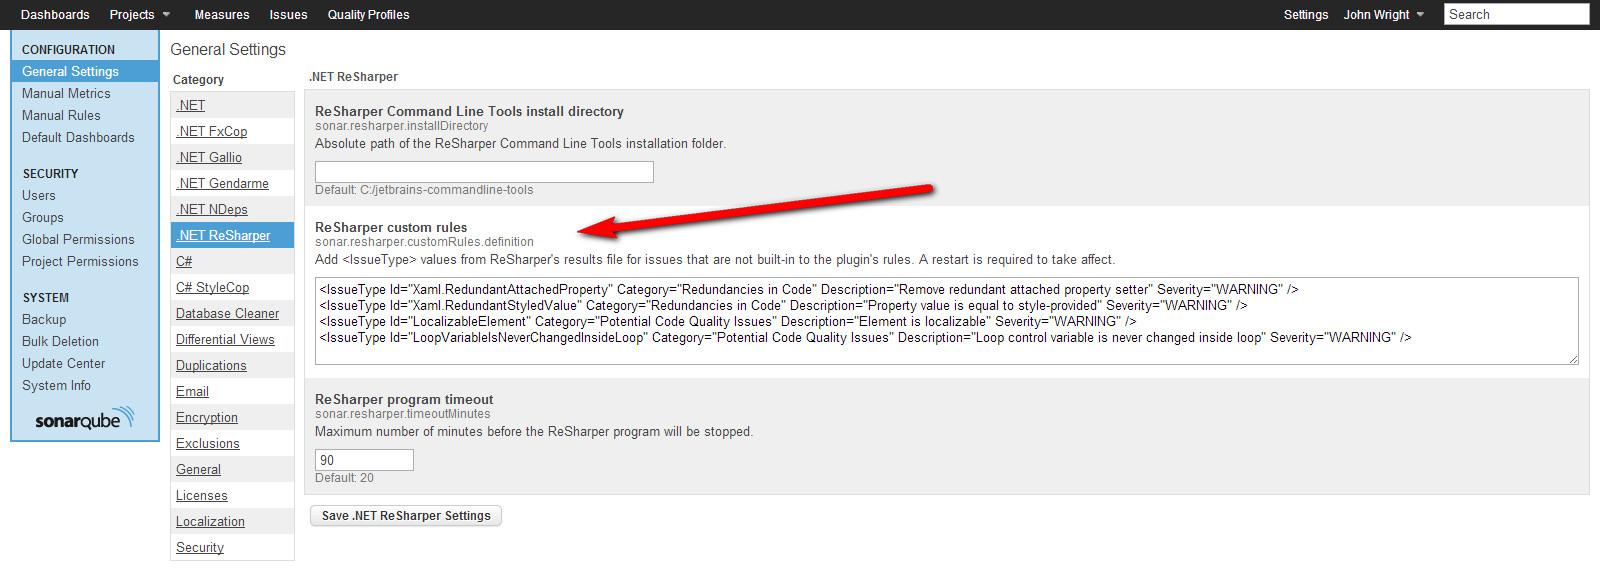 SonarQube  NET ReSharper Plugin Beta Release - Musing, Rants